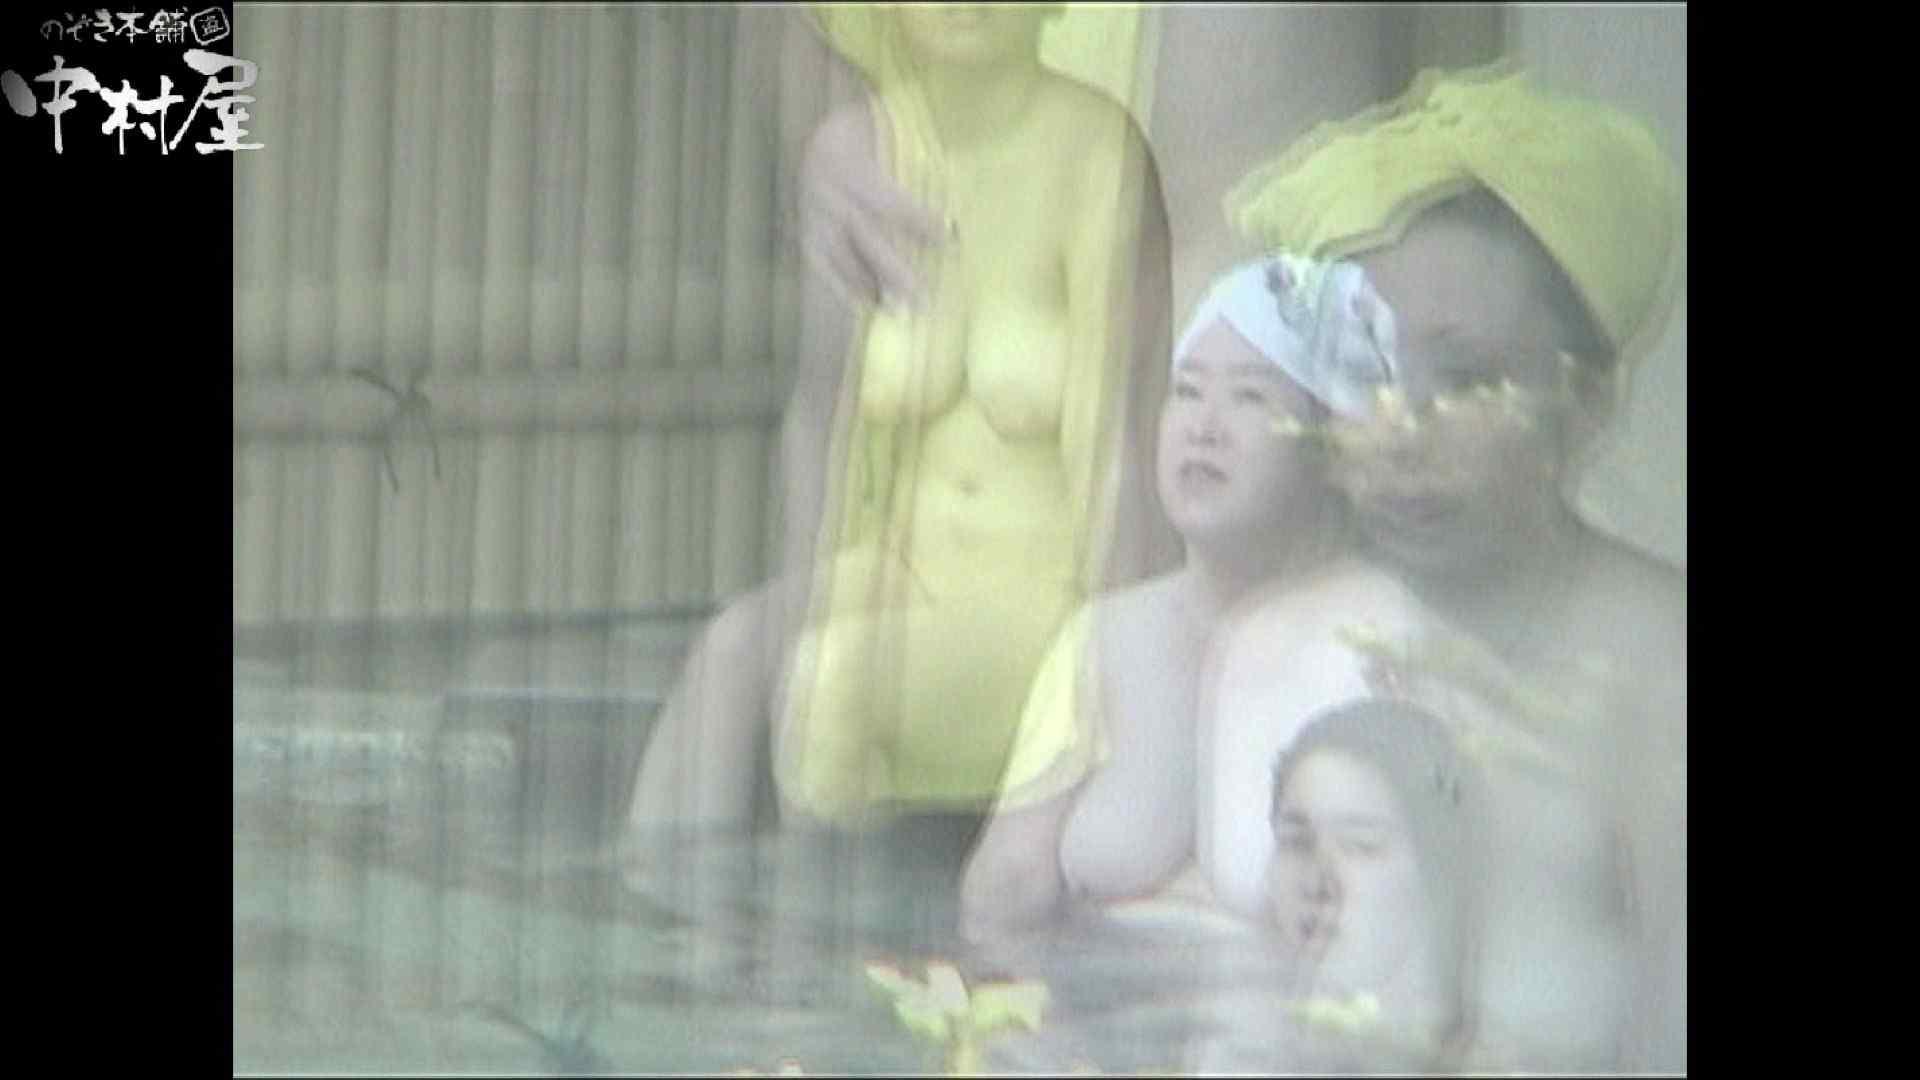 Aquaな露天風呂Vol.902 盗撮師作品  104pic 69